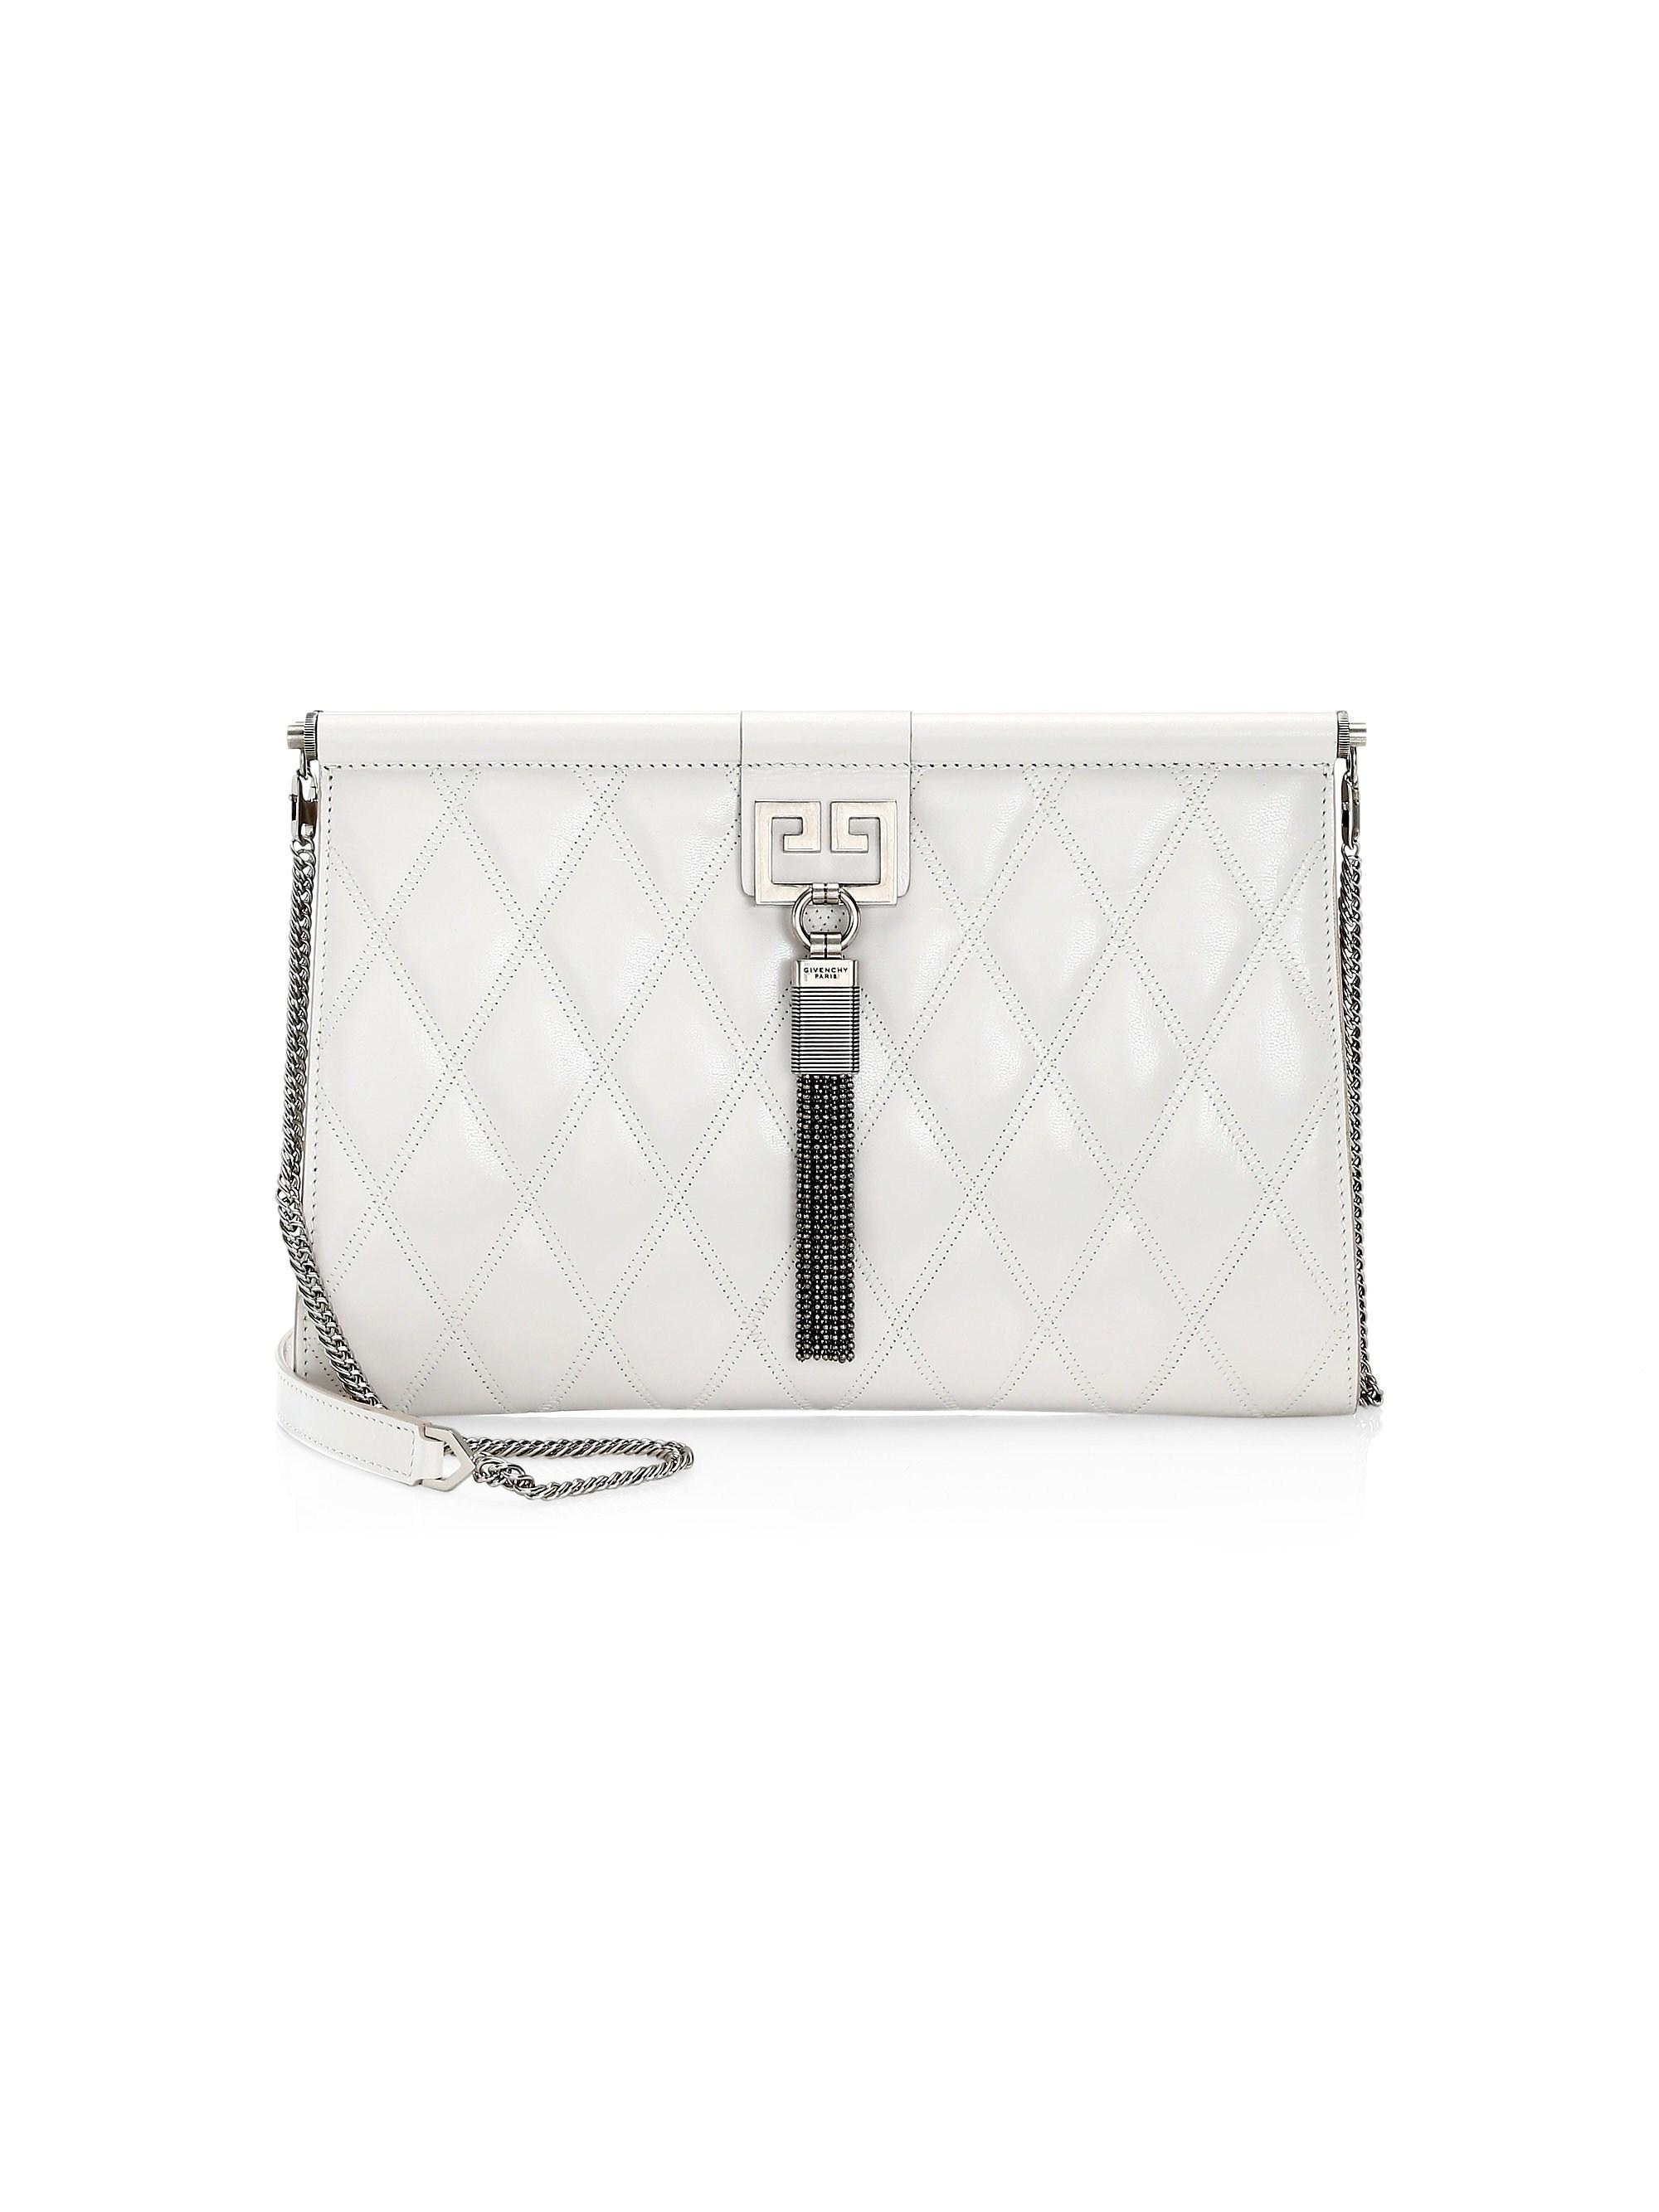 Lyst - Givenchy Women s Medium Gem Quilted Leather Shoulder Bag ... c189827b48